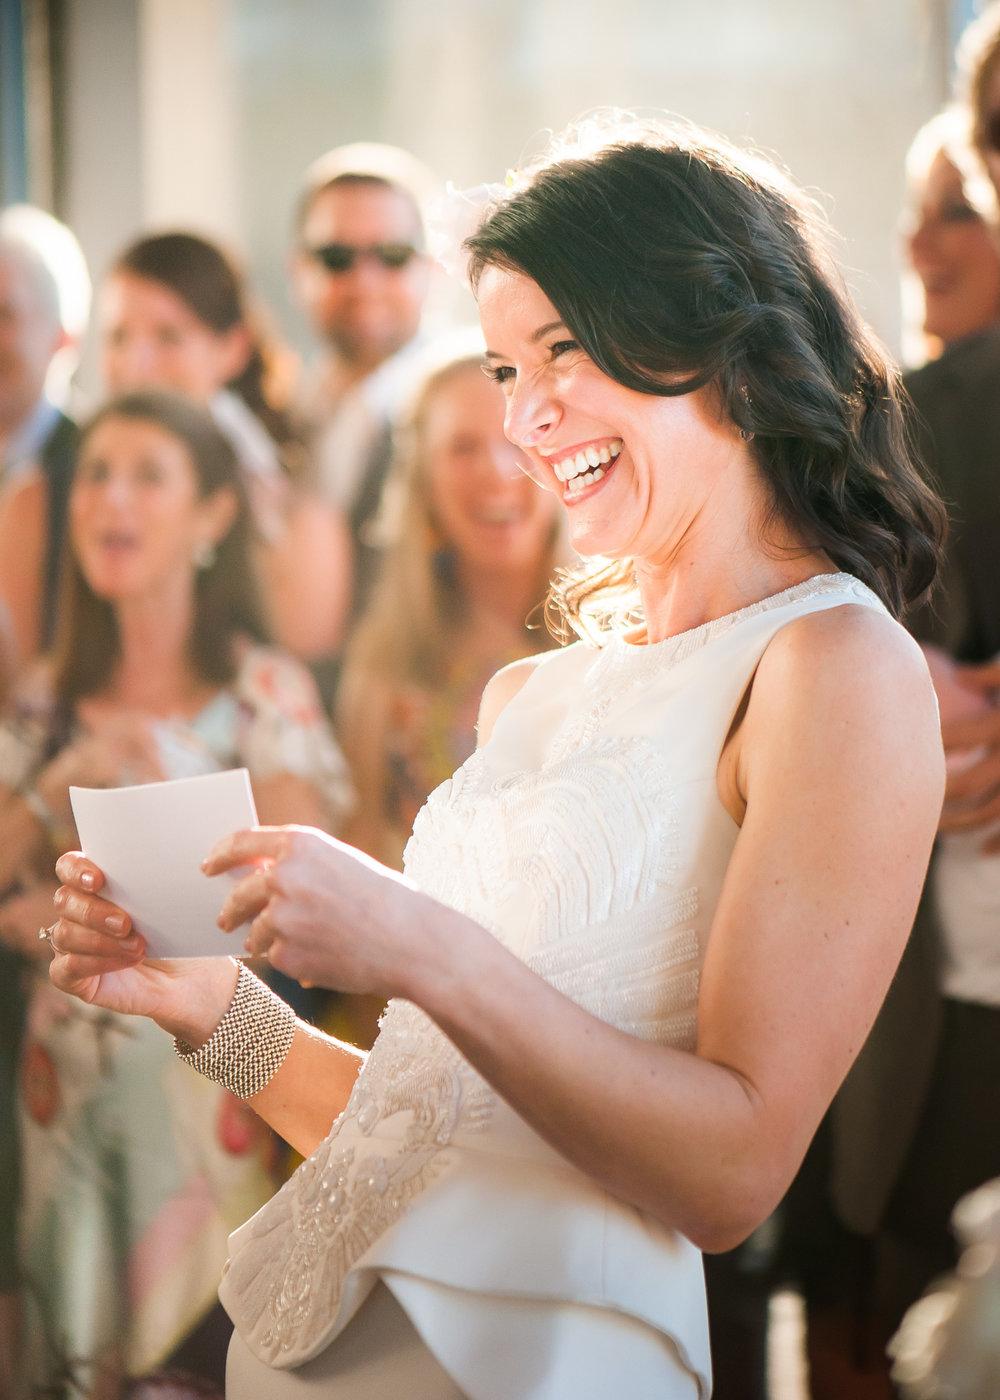 Marryme_wedding_photography_dorrigo_bellingen_photographer_45.jpg